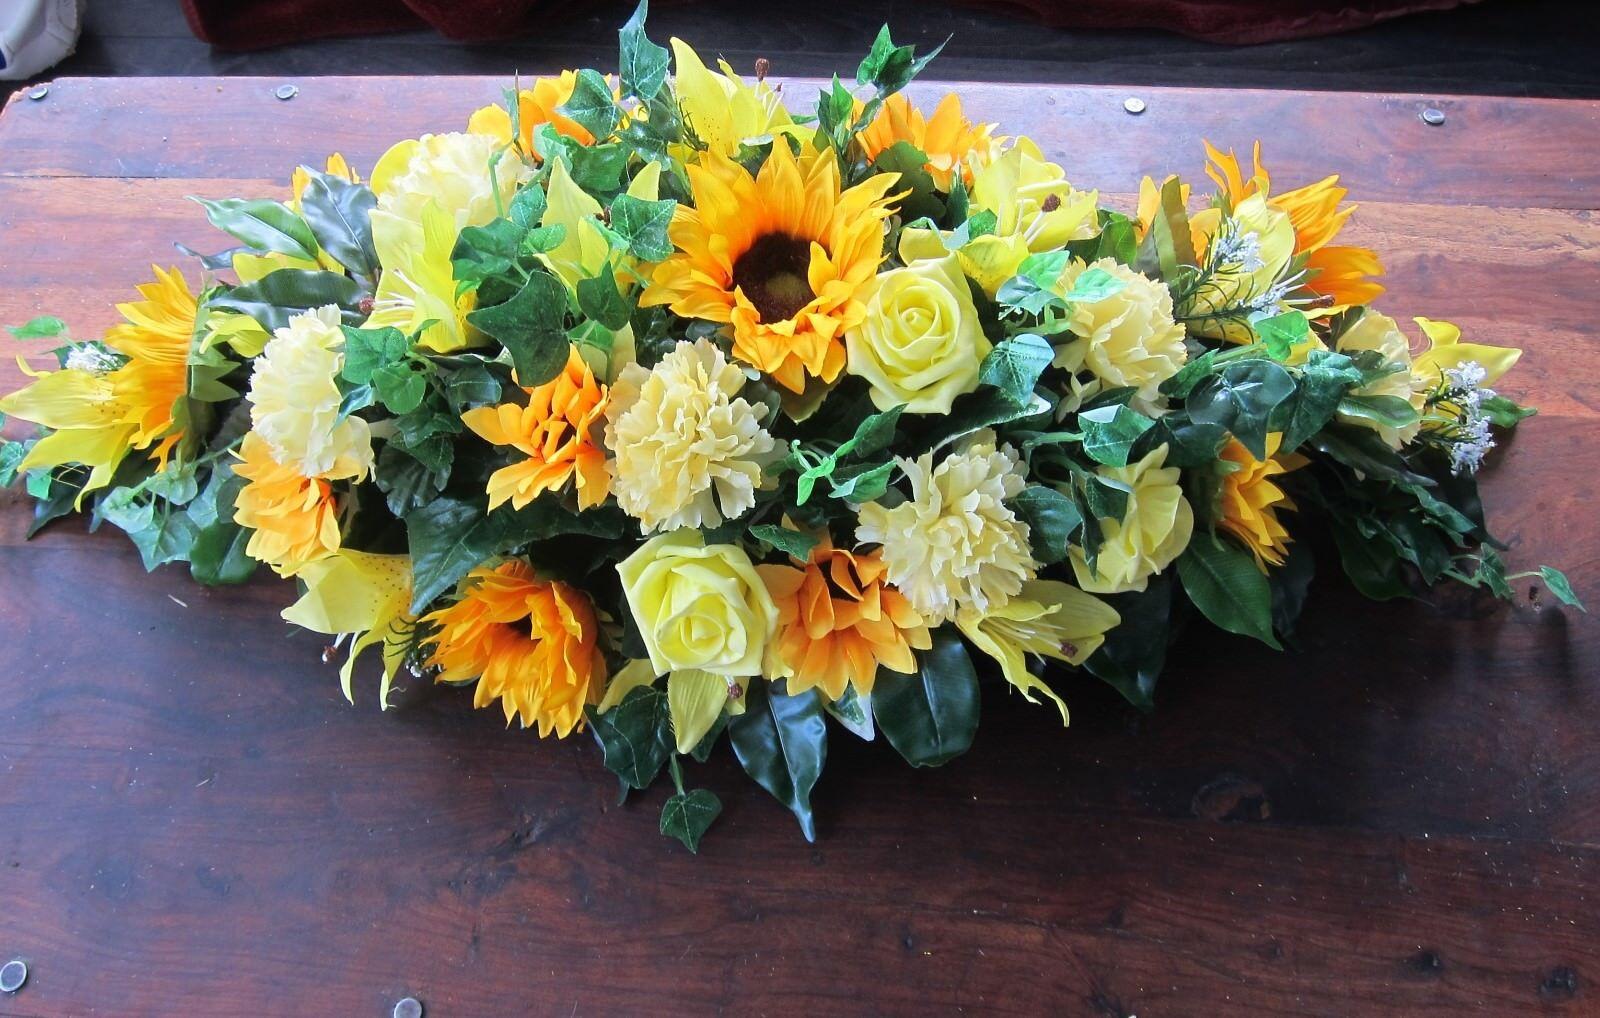 Funeral Casket Coffin Top Oasis Sunflower Arrangement Tribute - Any colour